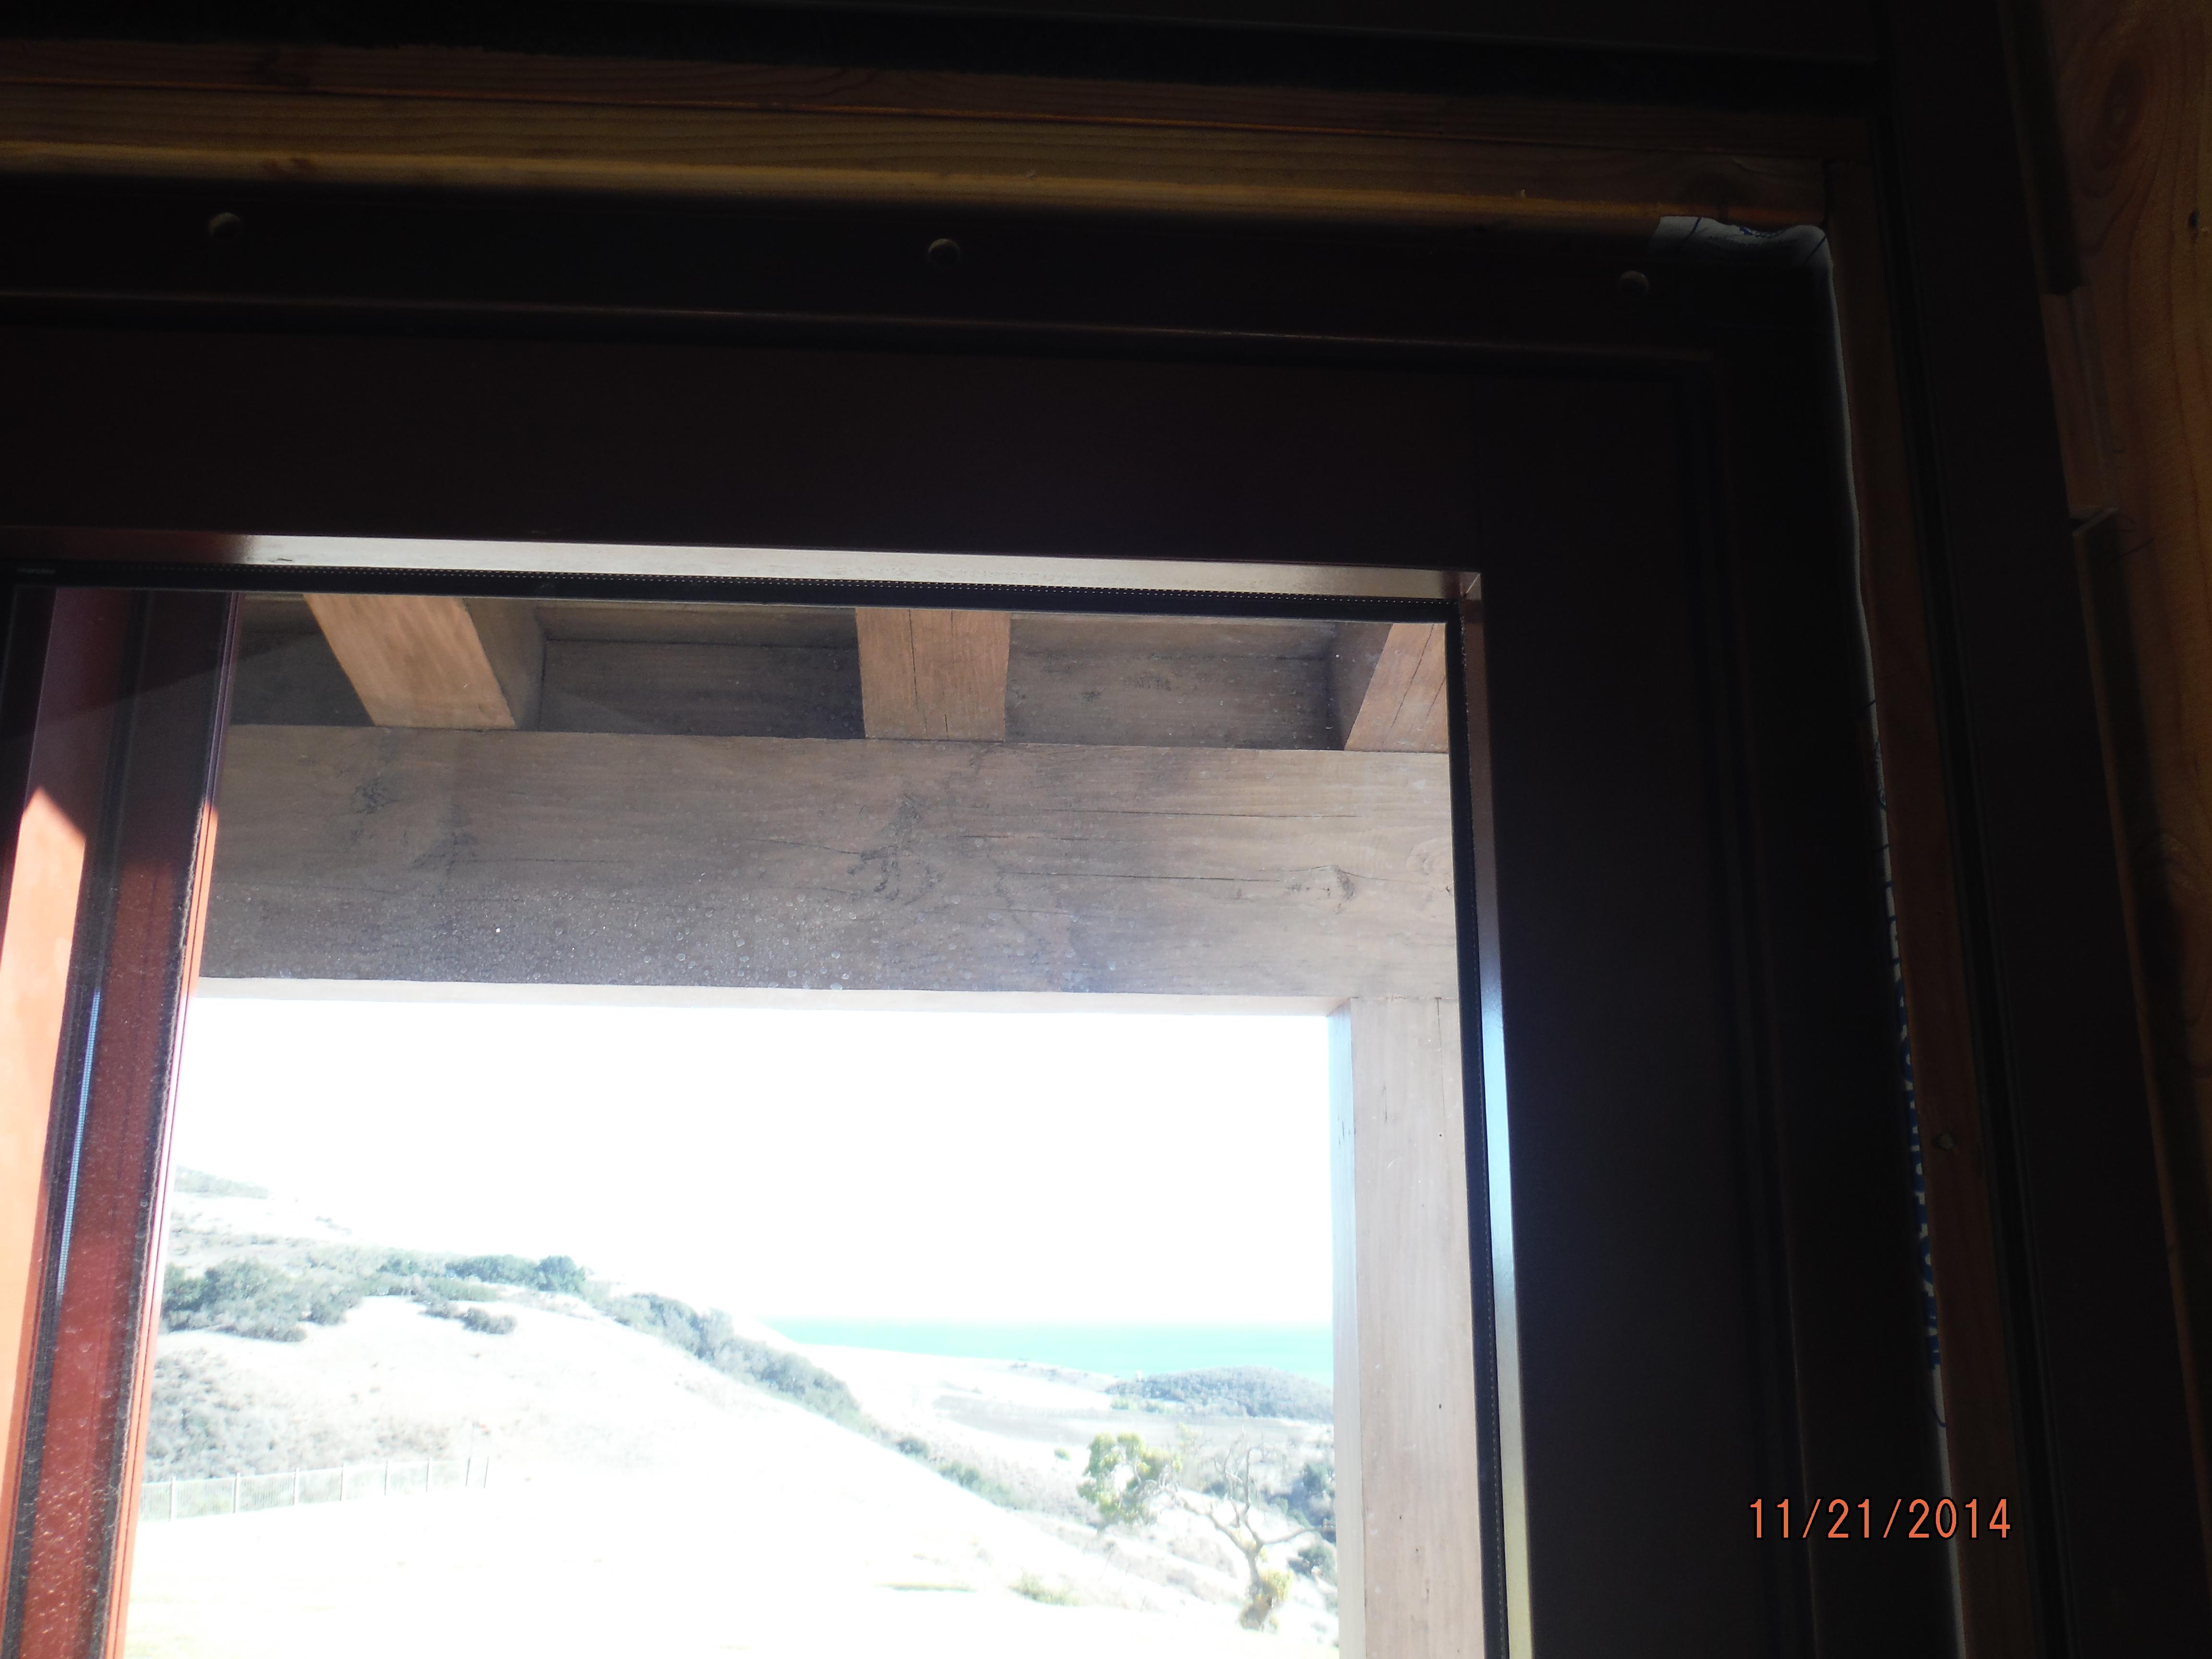 Installation Motorized Power Screens front view bi-folding windows in Santa Barbara in 2nd floor